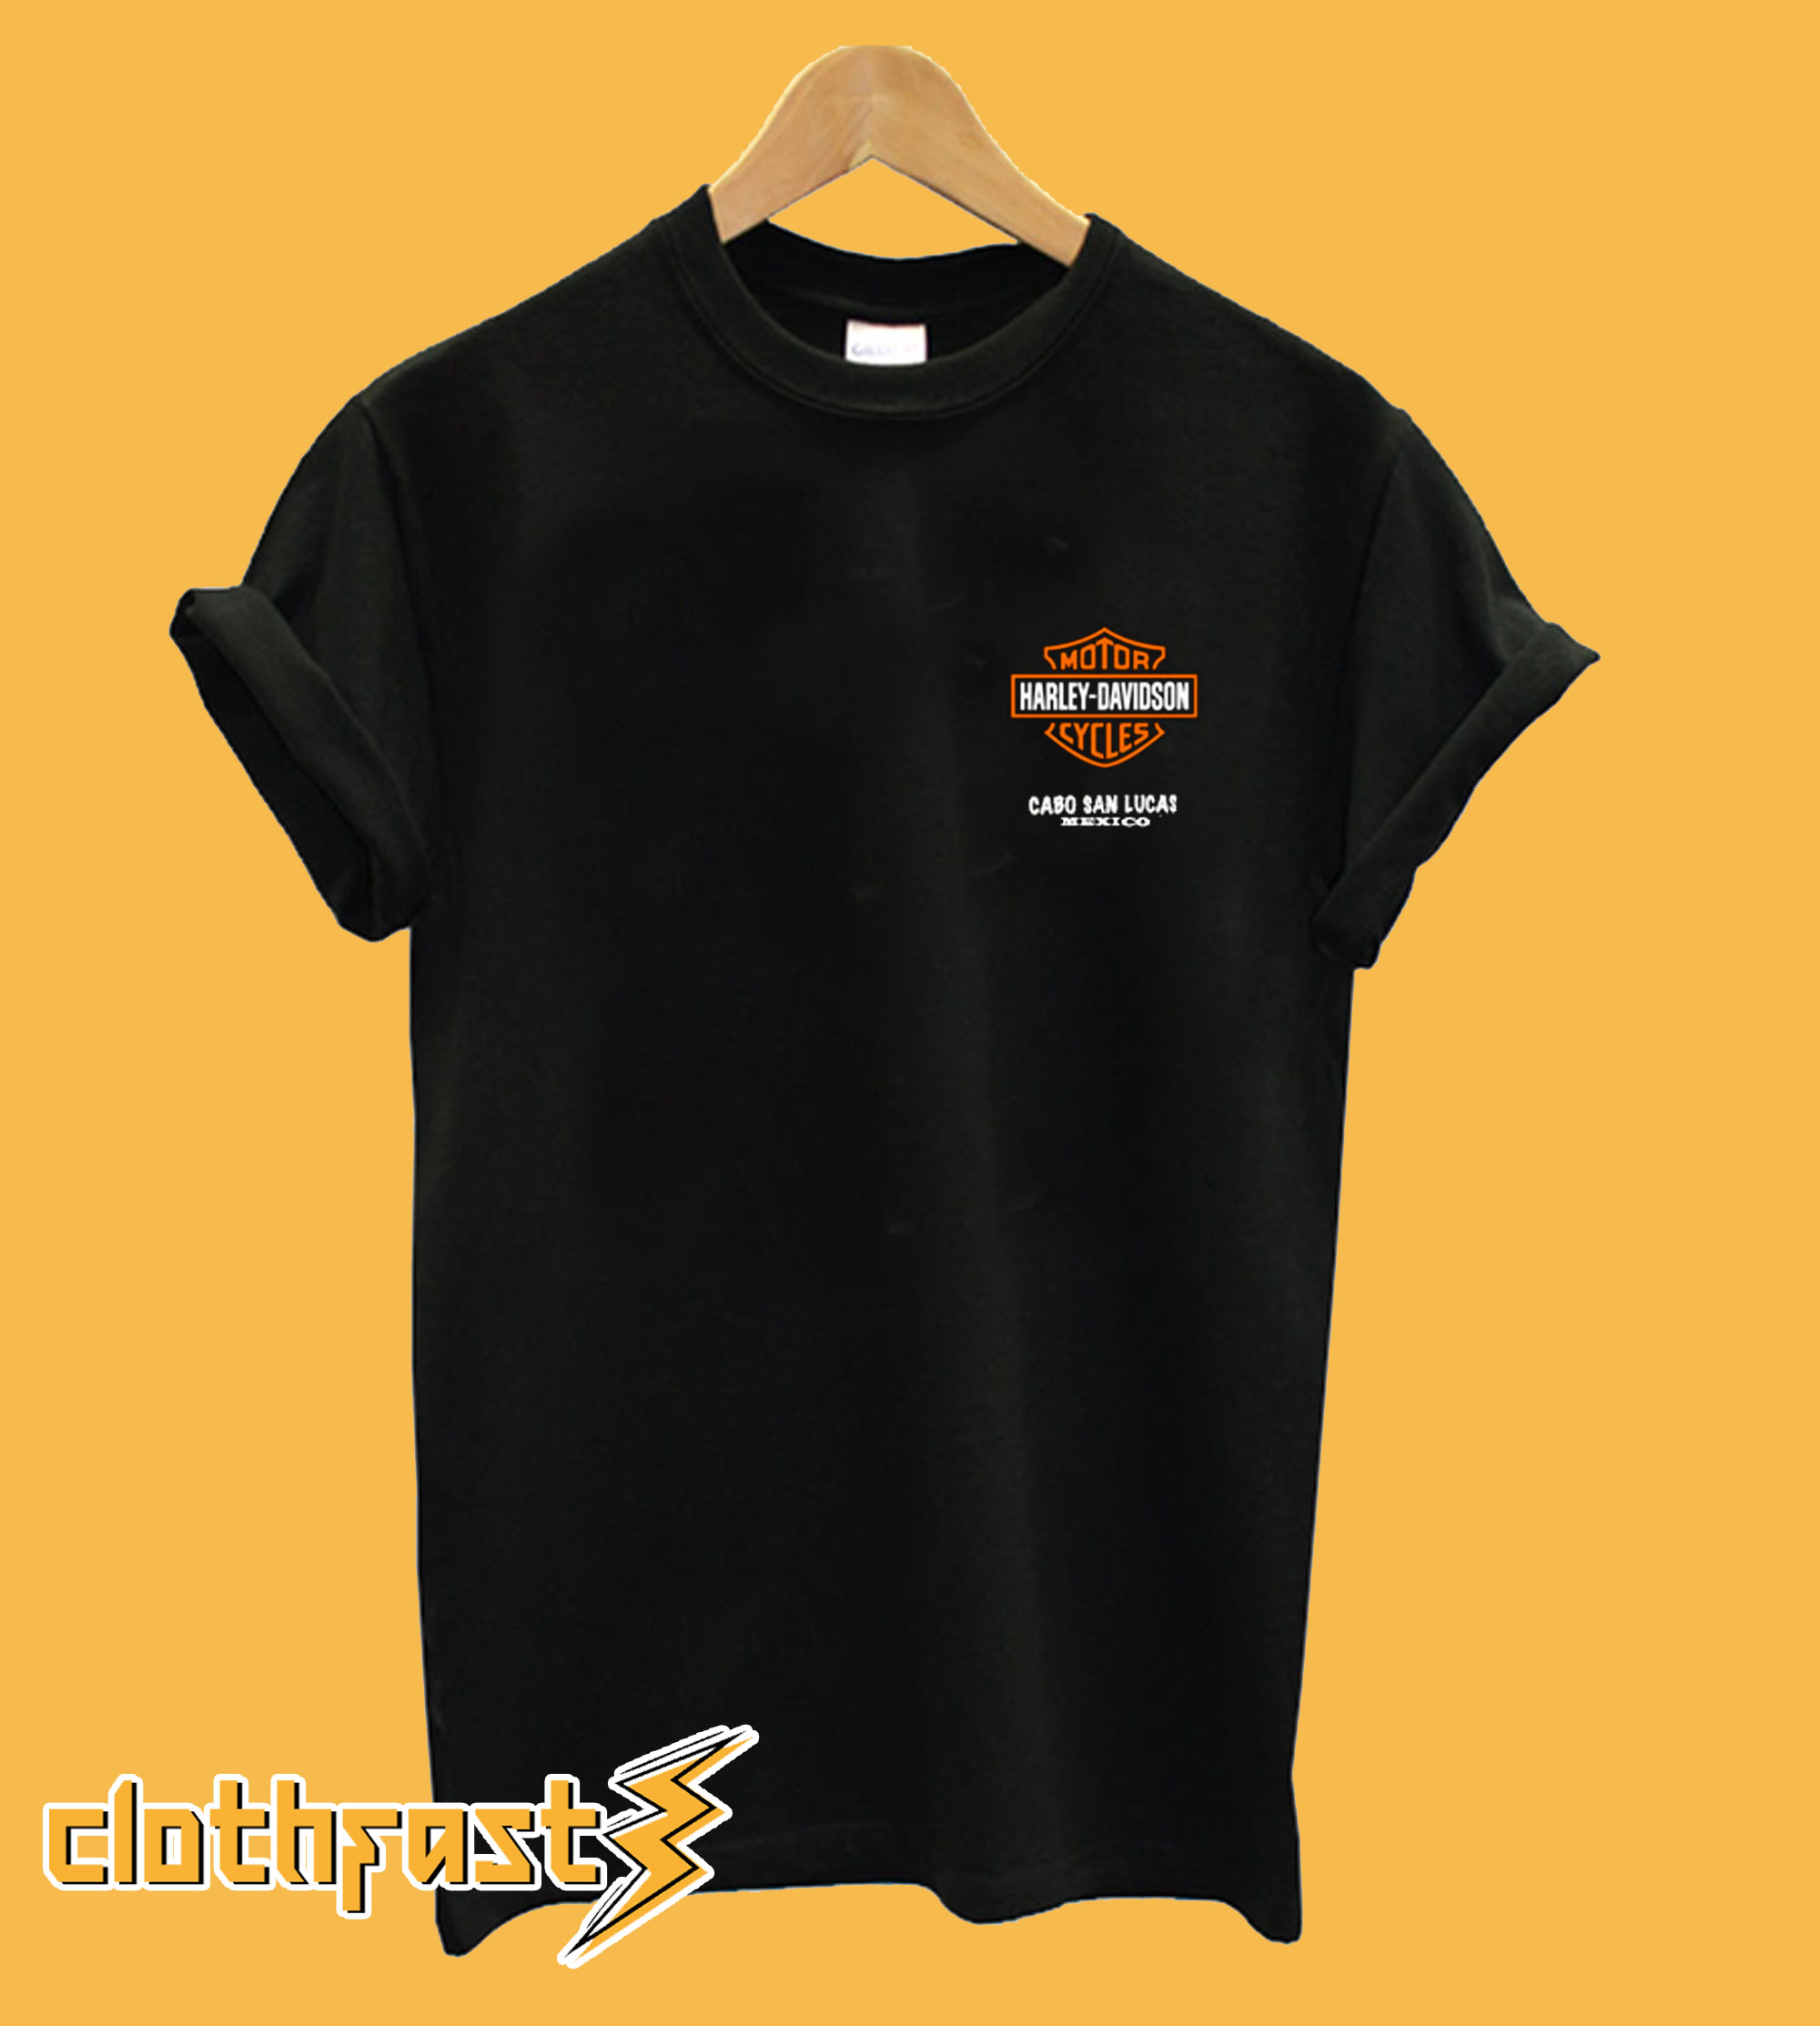 Harley Davidson Cabo San Lucas Mexico T-Shirt